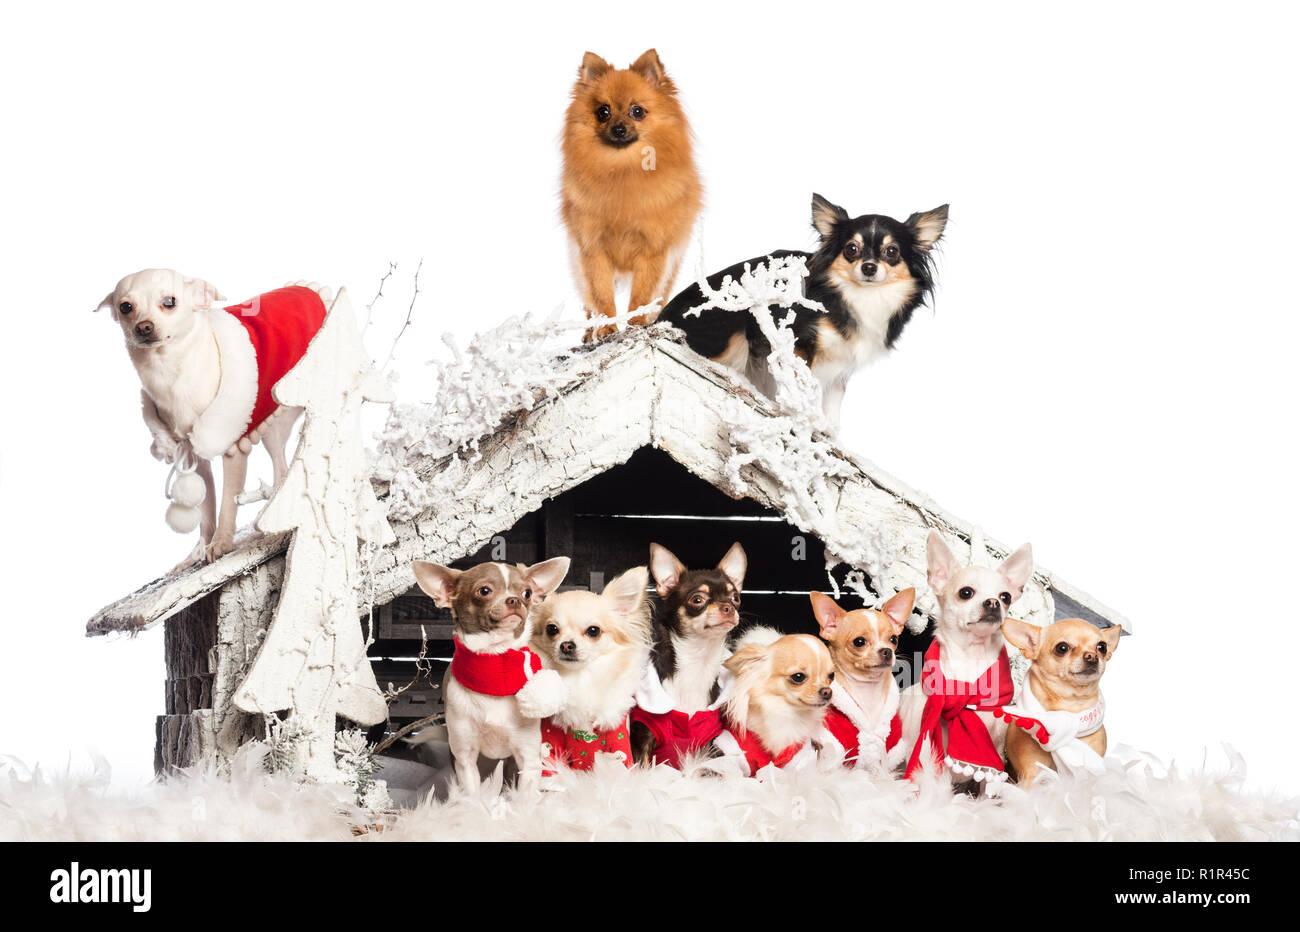 Dogs Group Christmas Stock Photos & Dogs Group Christmas Stock ...